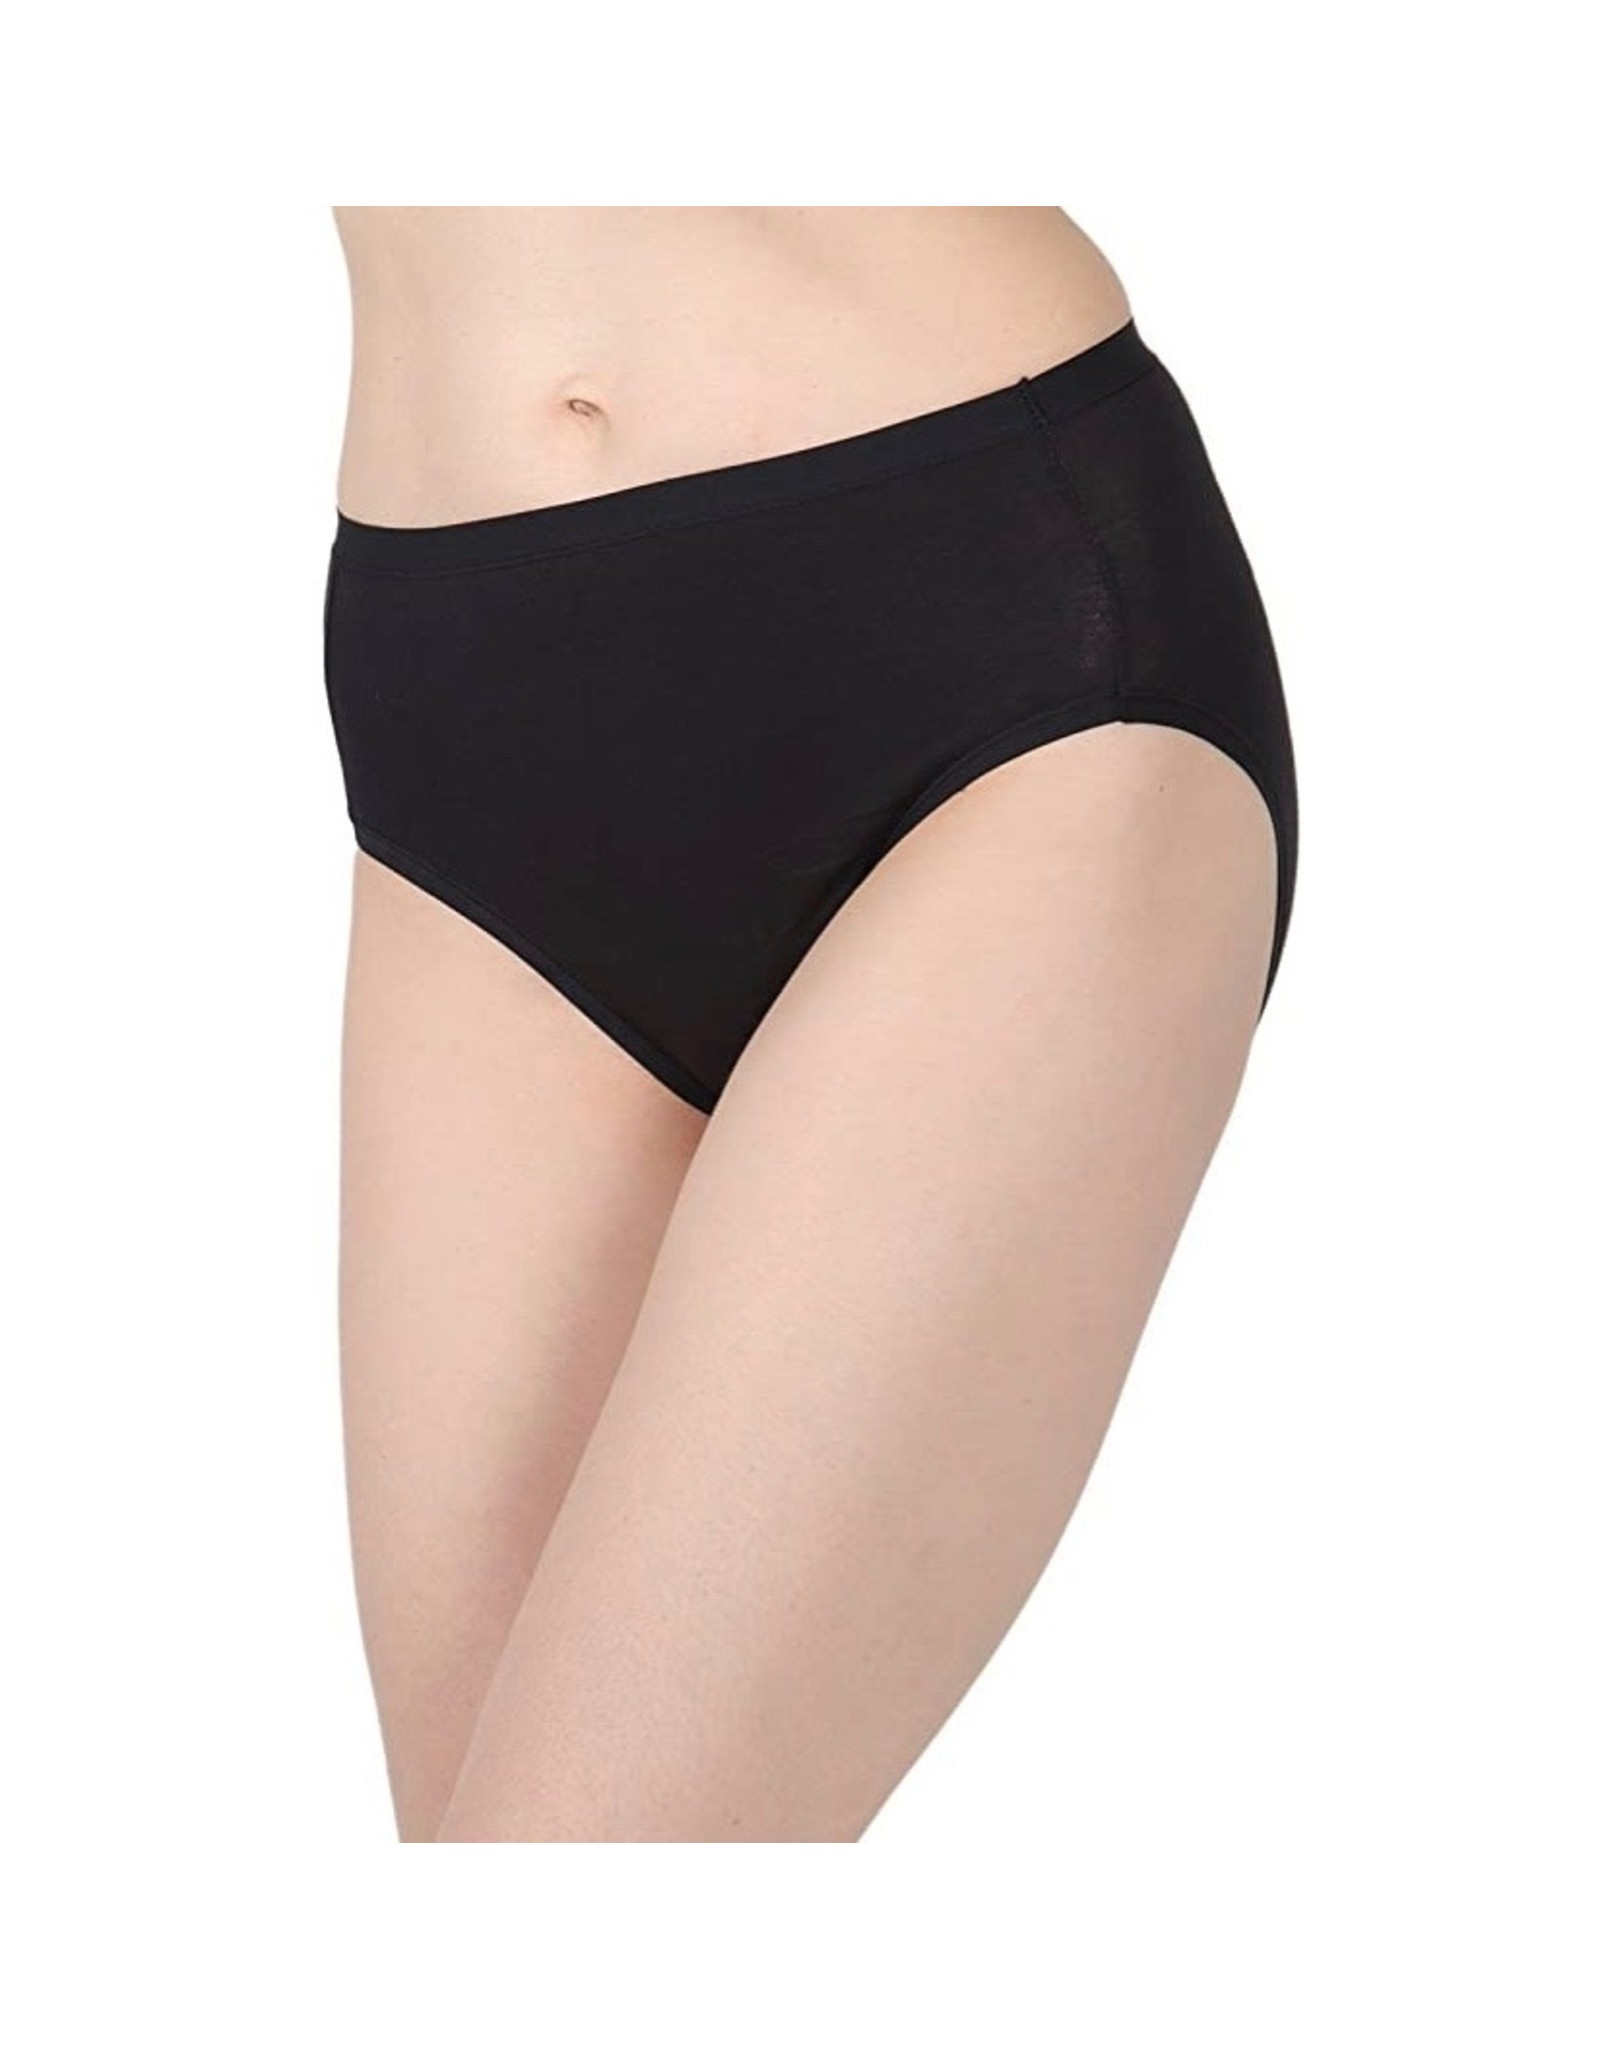 Memoi Memoi Ladies Brief Underwear 3-Pack MU-1013